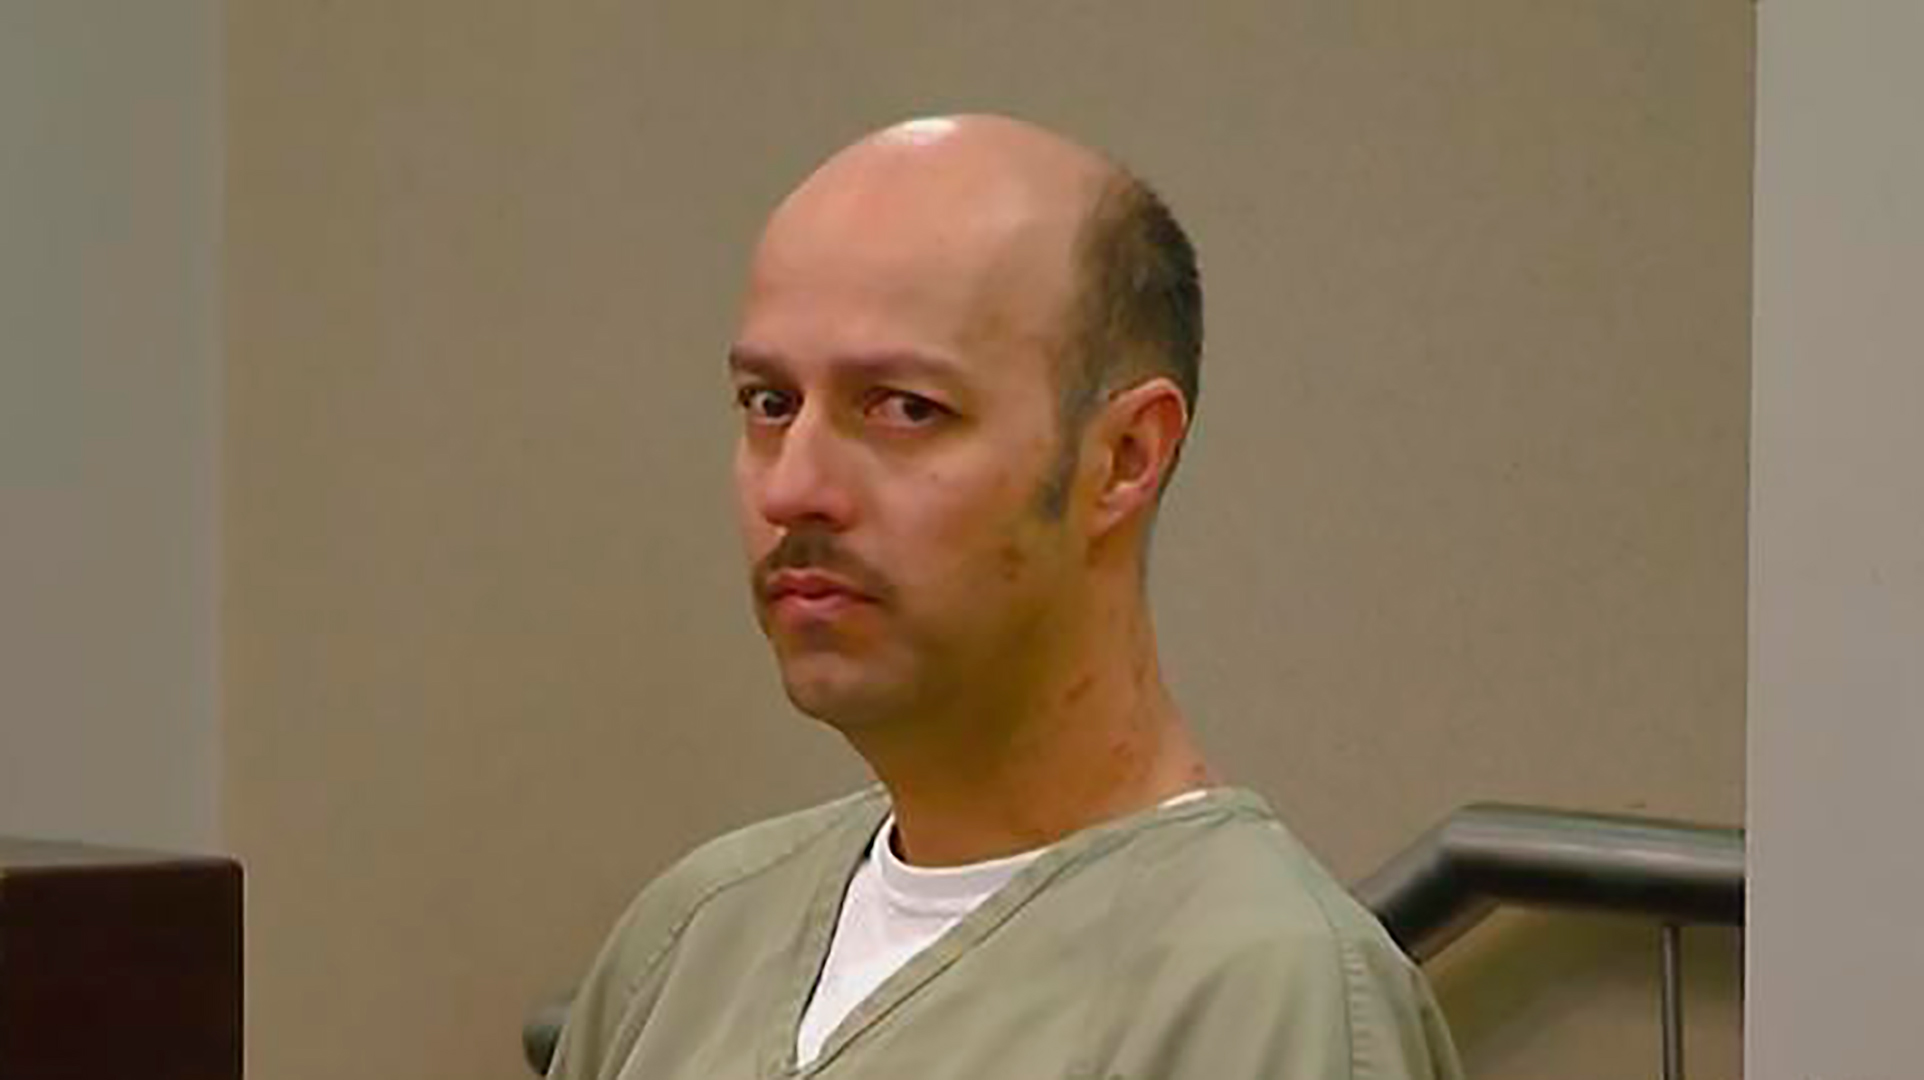 Condenan a Esteban Loaiza a tres años de prisión